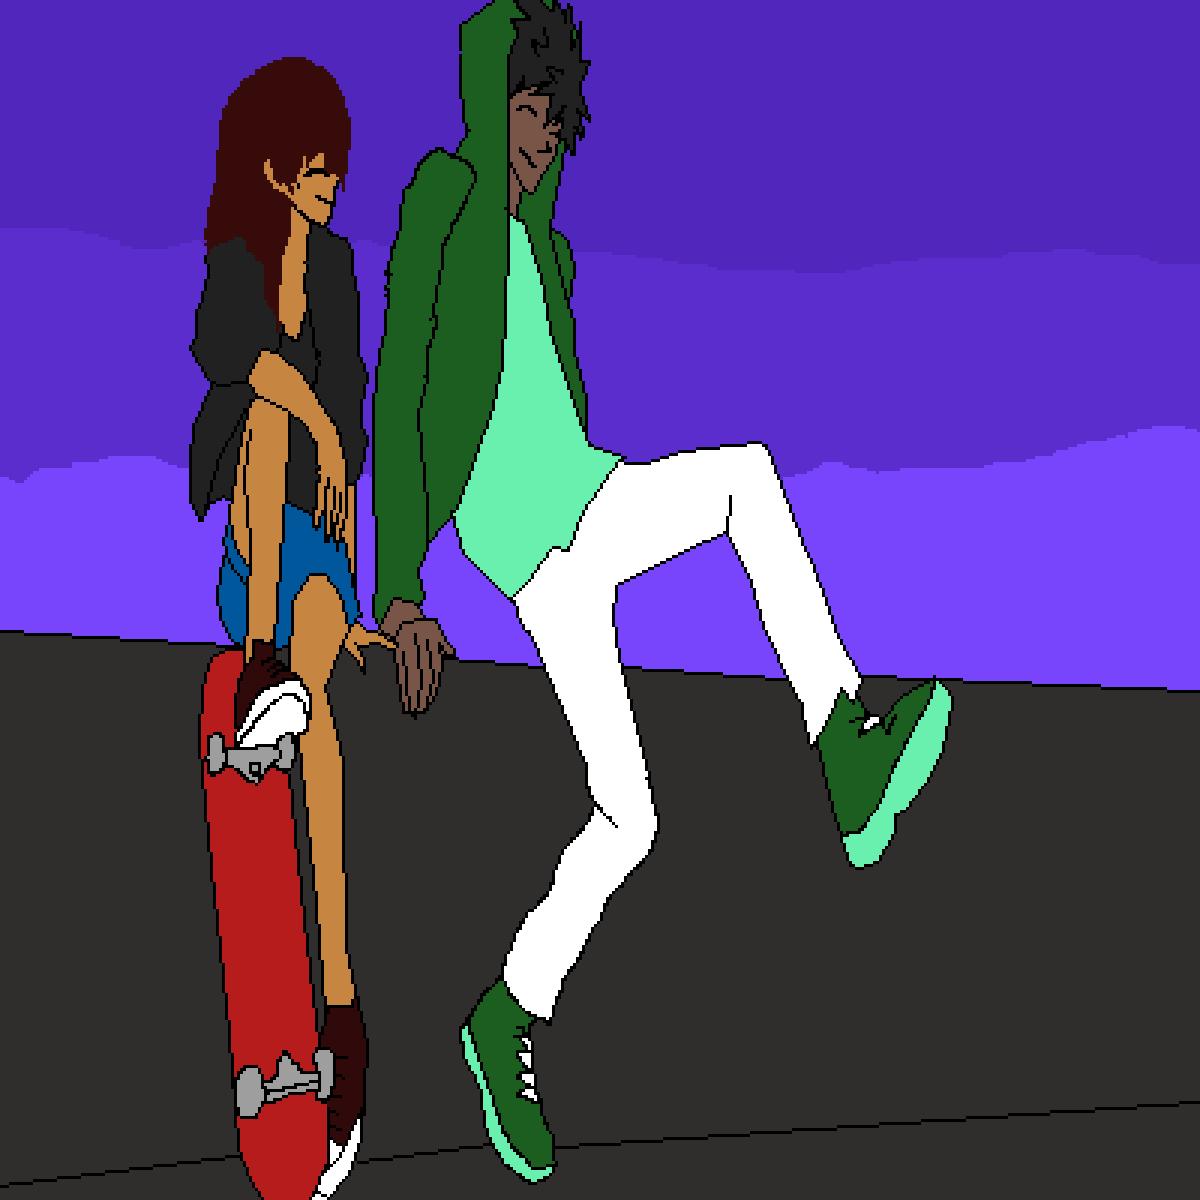 Skateboarding bros by Tysondagreat